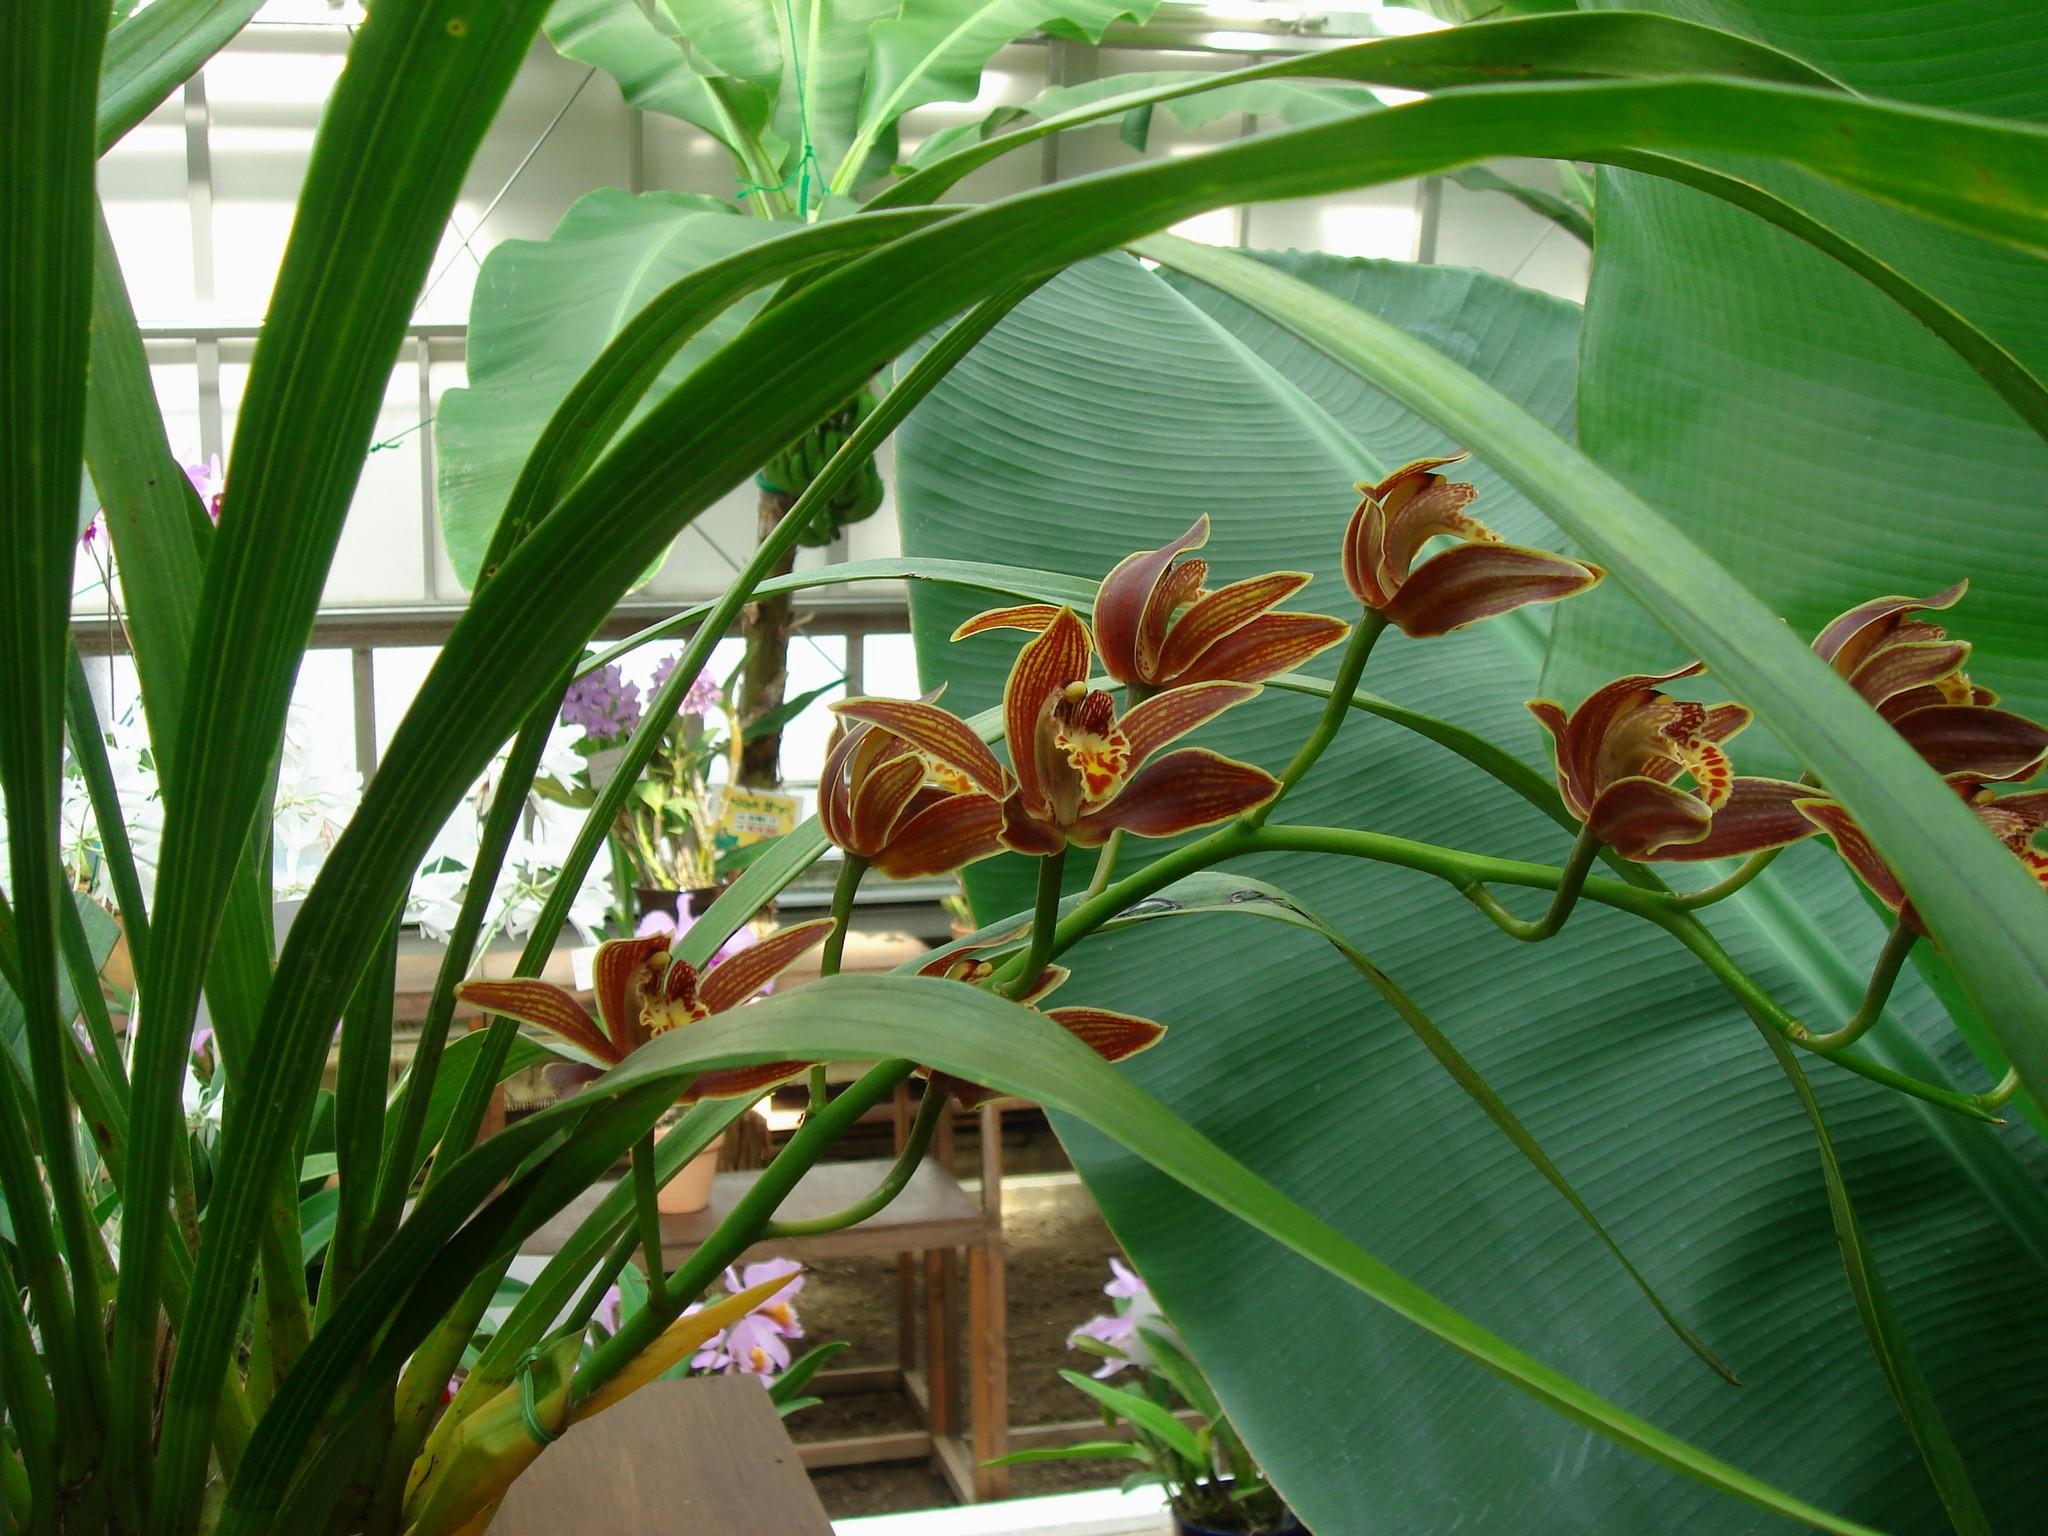 http://orchids.la.coocan.jp/Cymbidium/Cymbidium%20iridioides/DSC04054.JPG